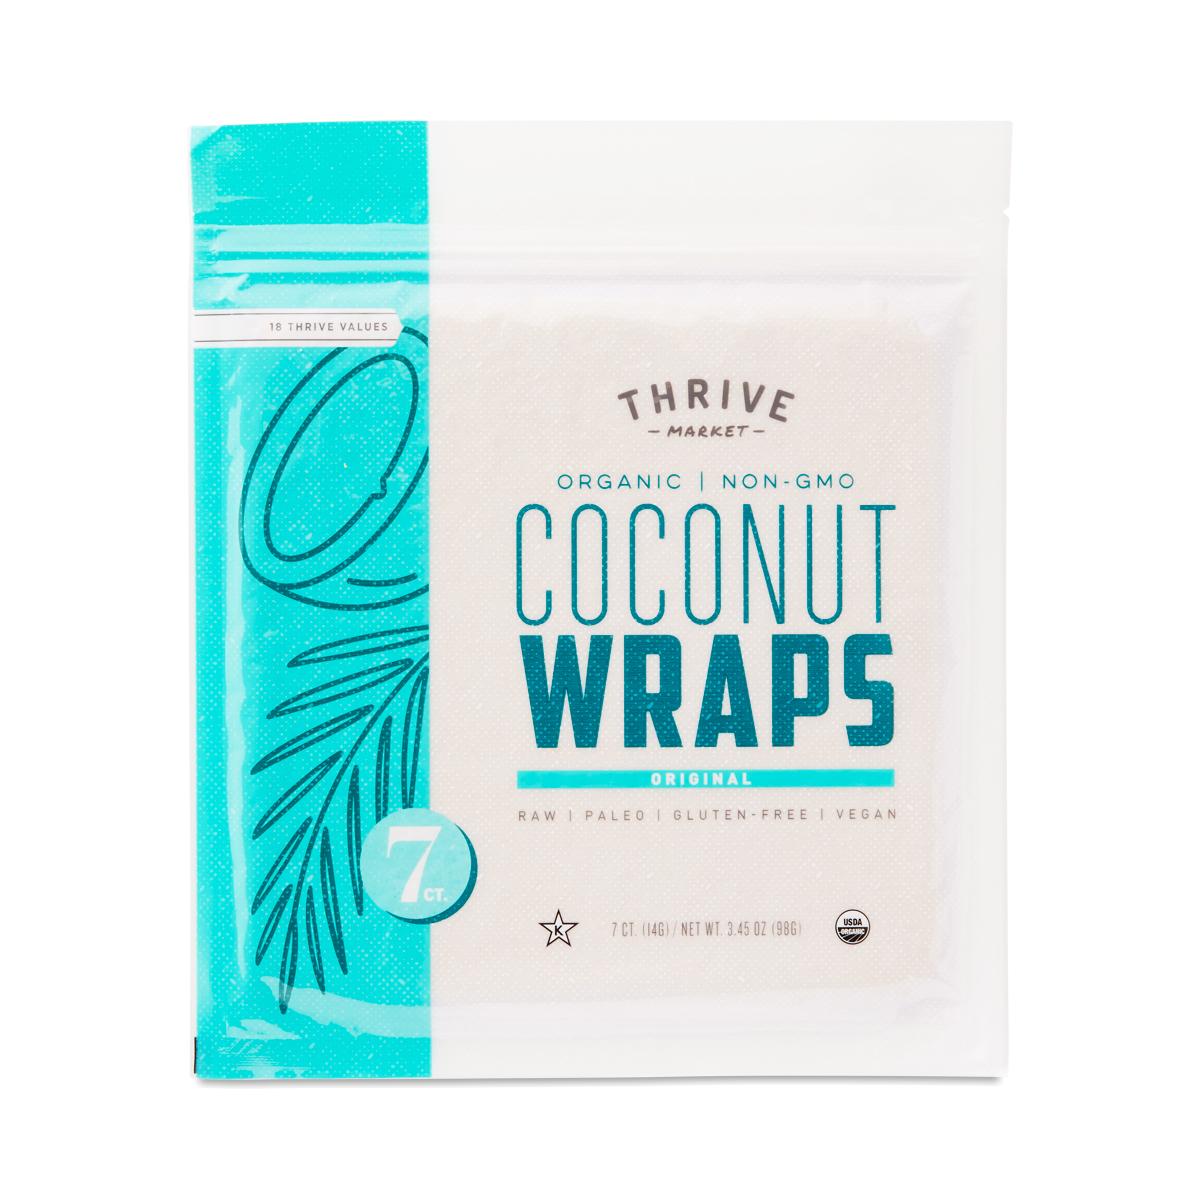 Thrive Market Organic Coconut Wraps, Original 7 (14g wraps)